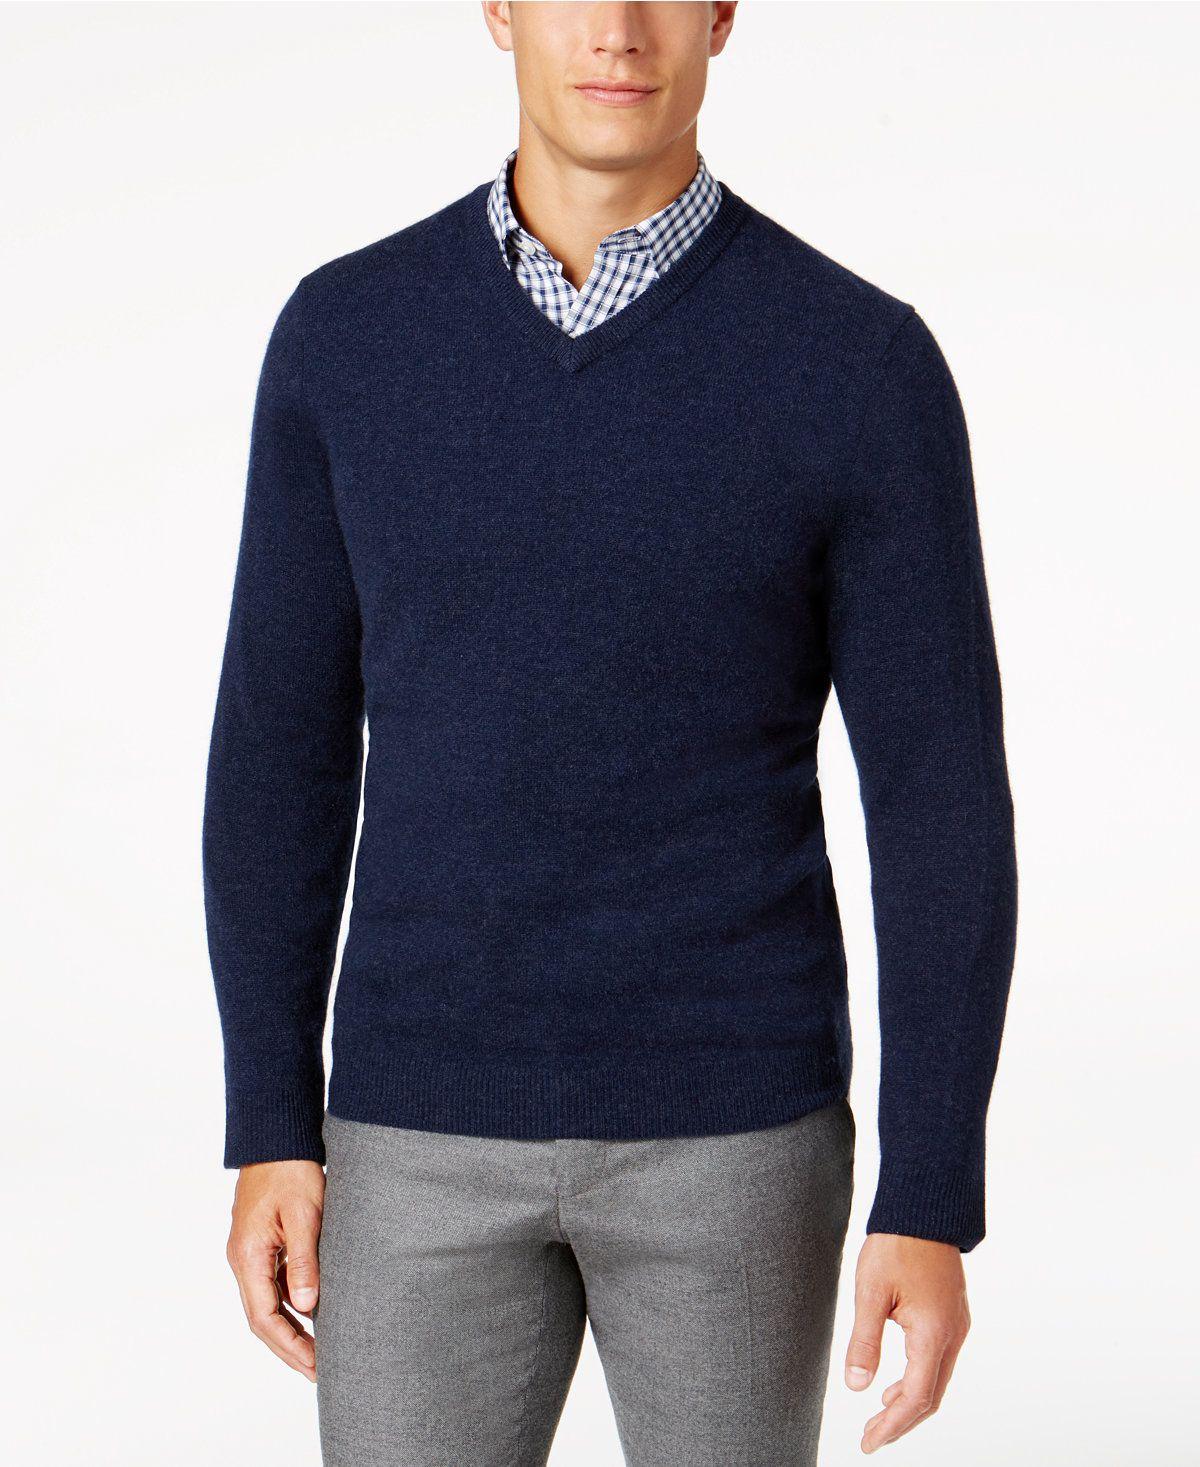 Men/'s V-Neck Cardigan Sweater Cardigan Sweater V-Neck Easy Club